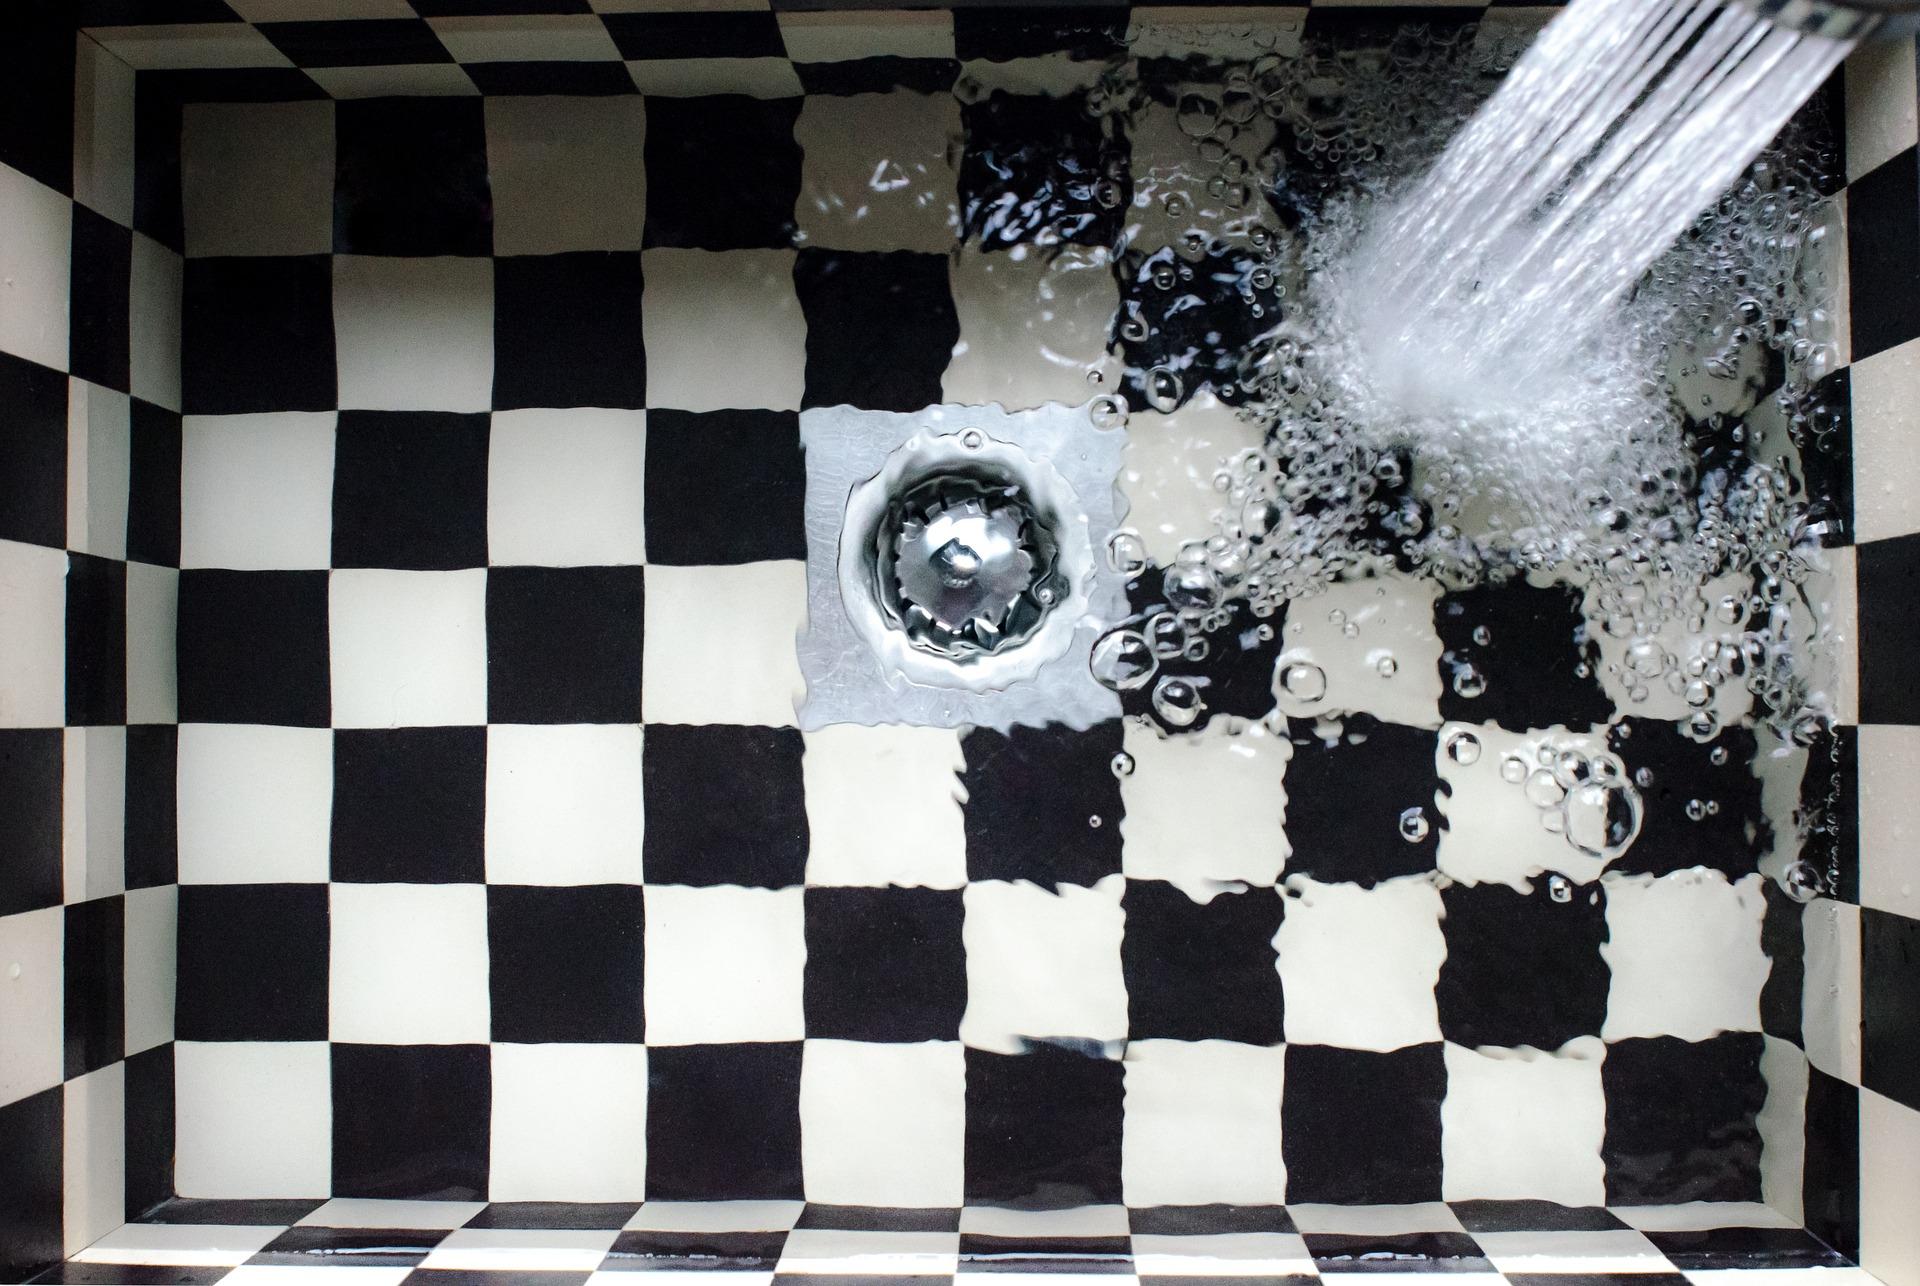 Checkered kitchen sink with water